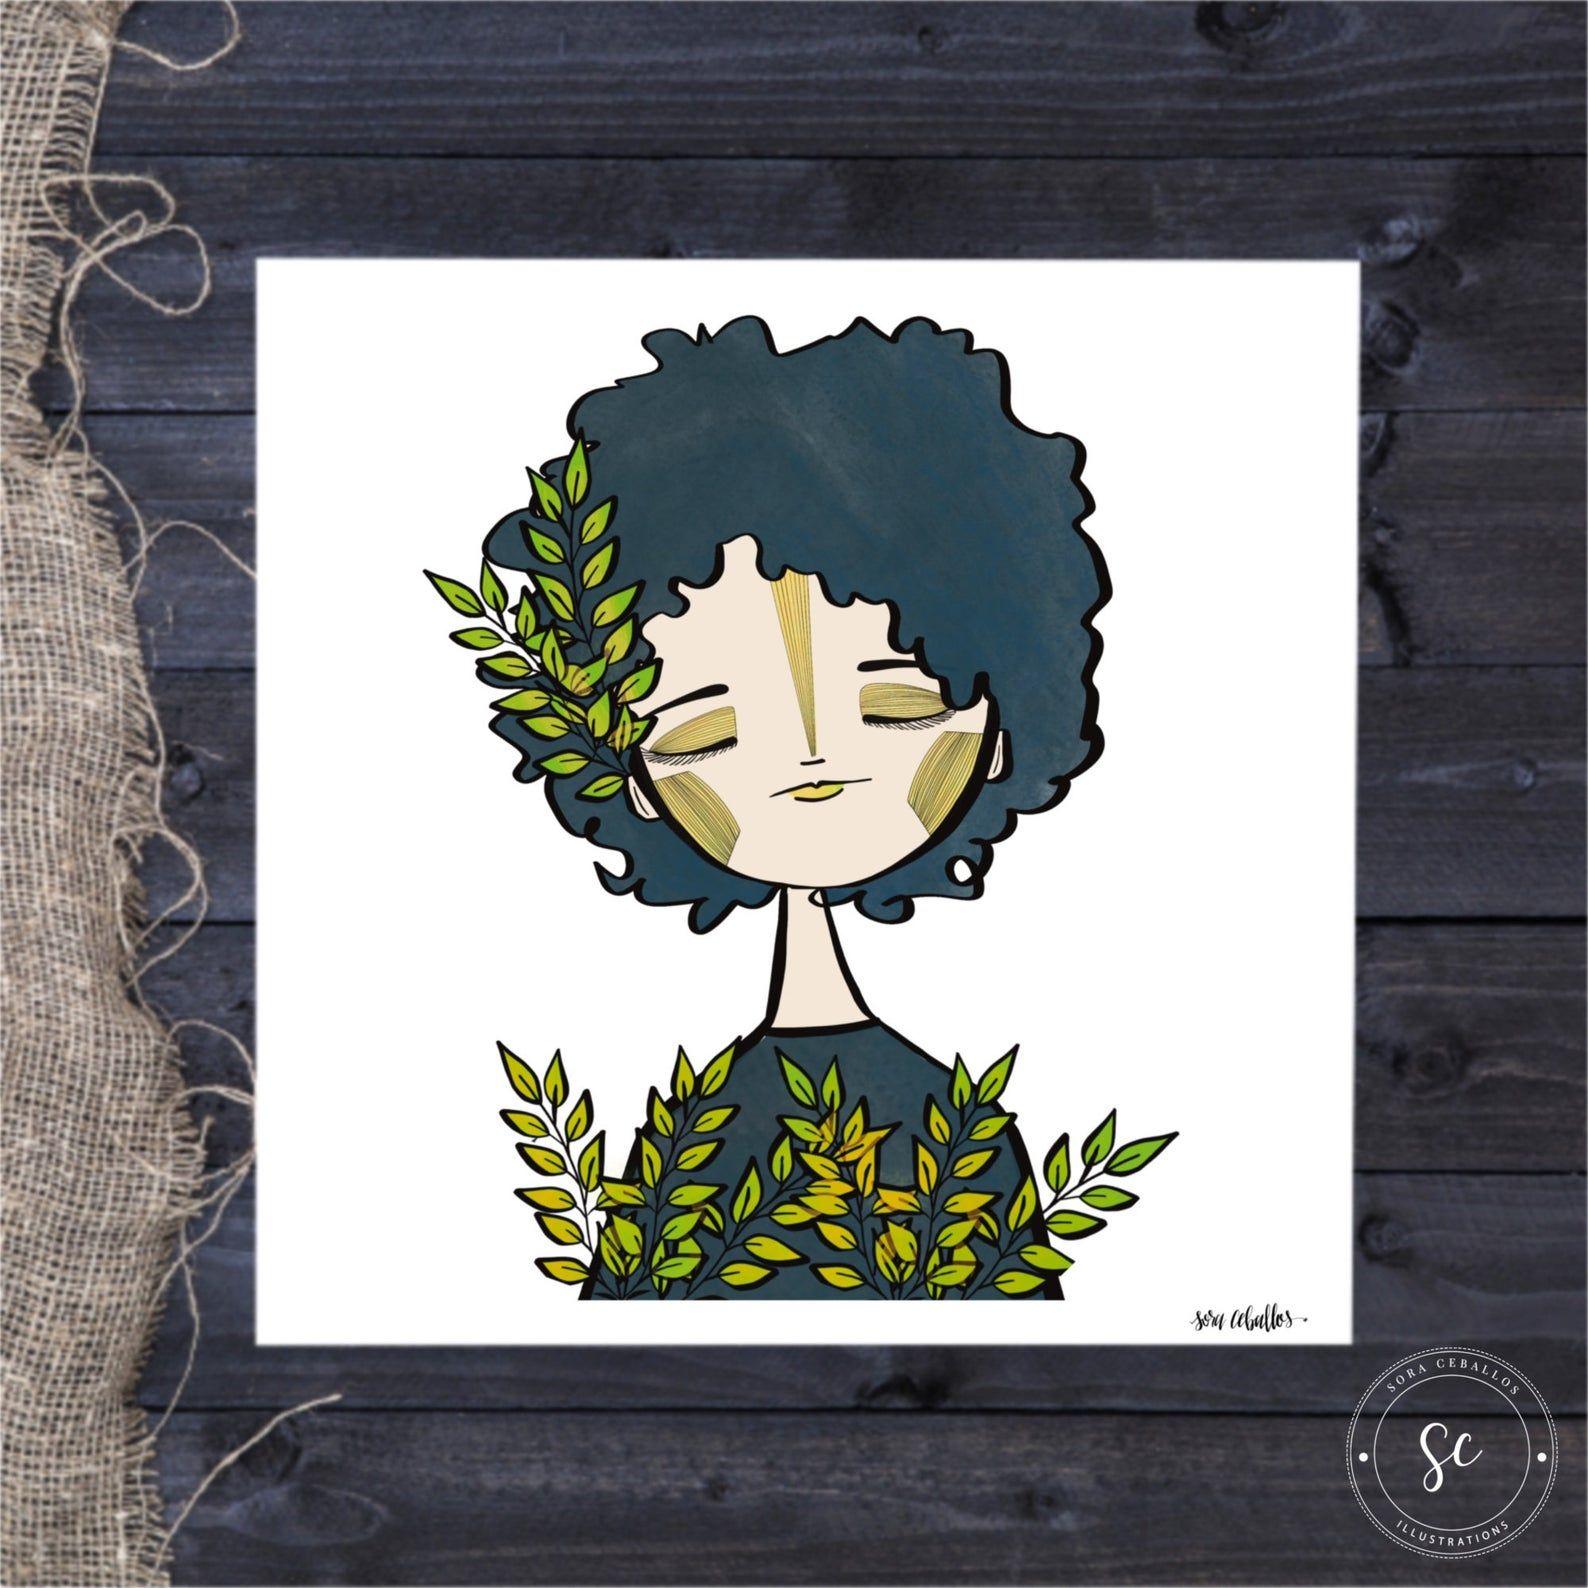 Peyton, Whimsical Girl, Print, Portrait, Illustration, Art, Drawing